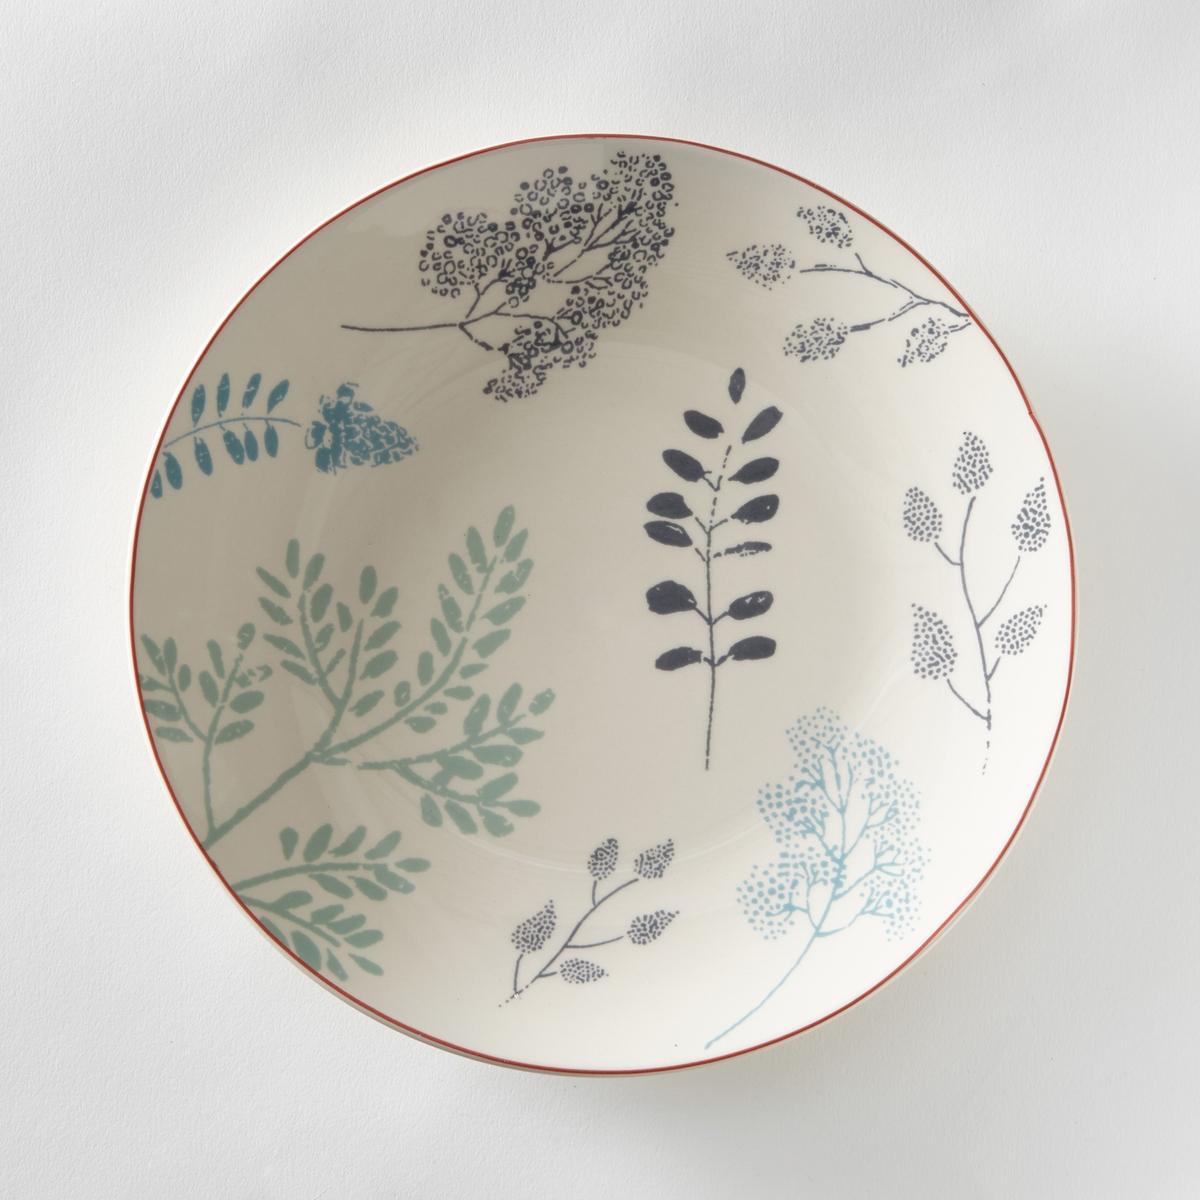 La Redoute Interieurs 4 тарелки плоские с рисунком гербарий